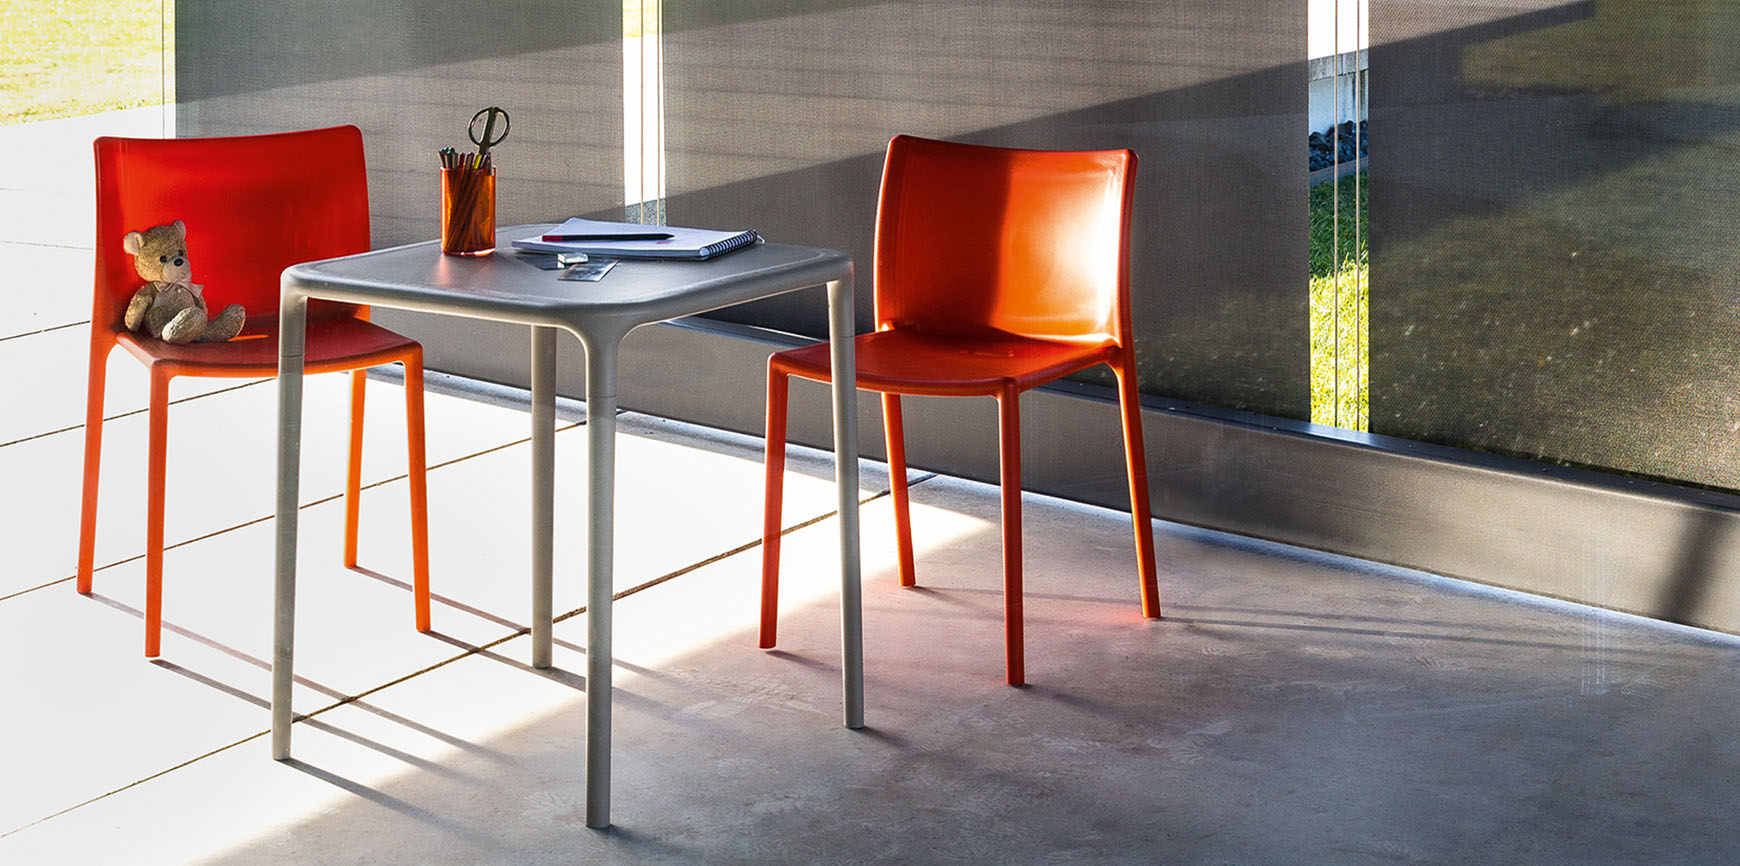 Magis Air Chairs & Air Table By Jasper Morrison - Orange 1086 C - Lifestyle Image